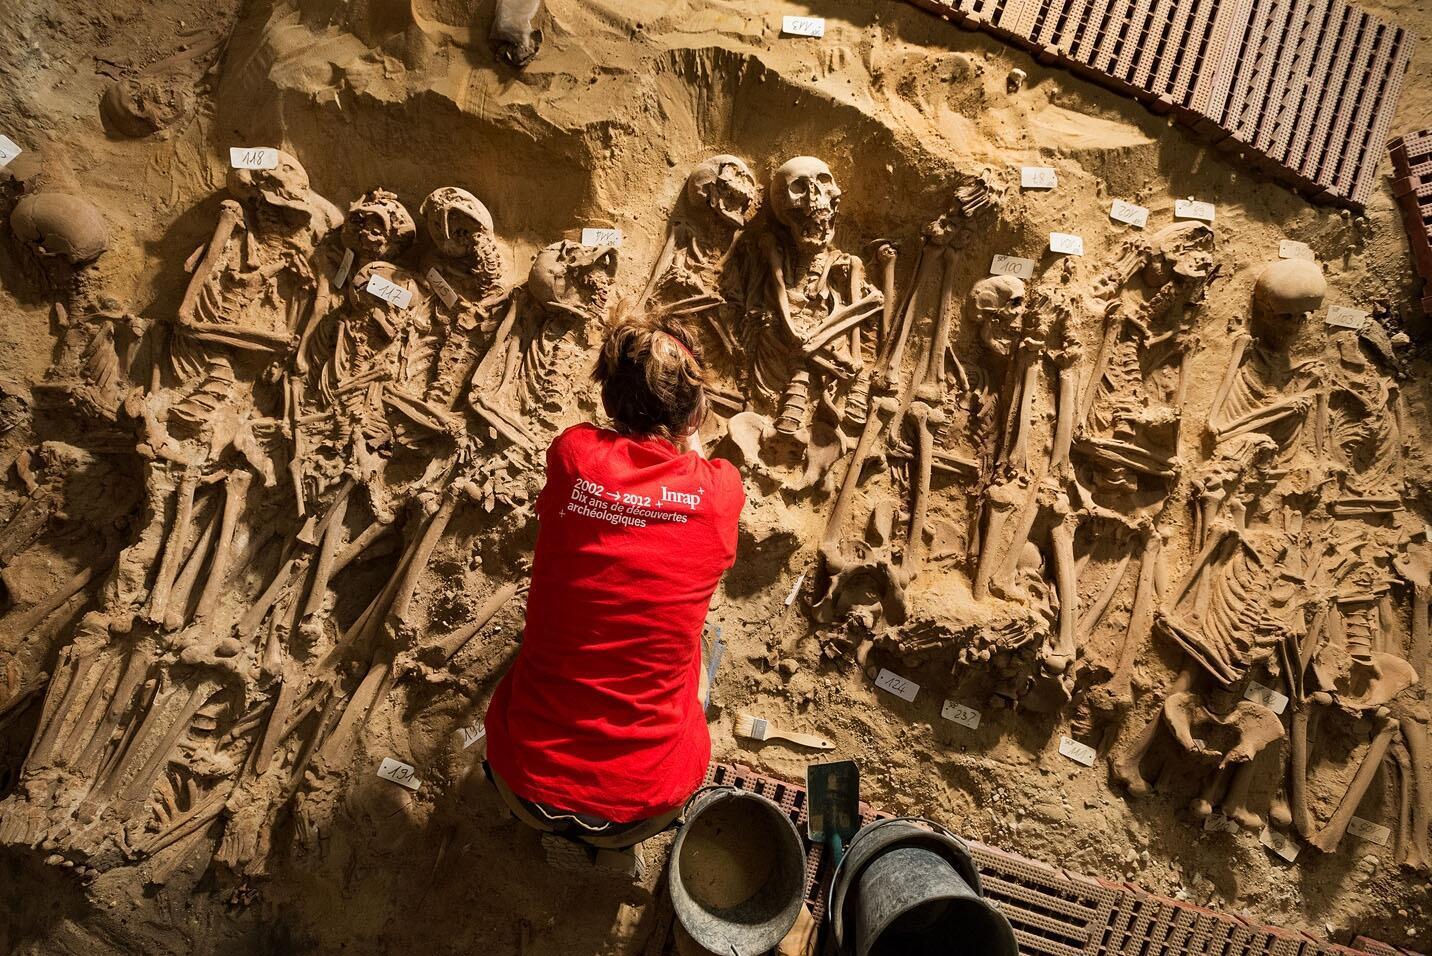 More than 200 skeletons have been discovered beneath a supermarket on Boulevard Sebastopol in Paris.